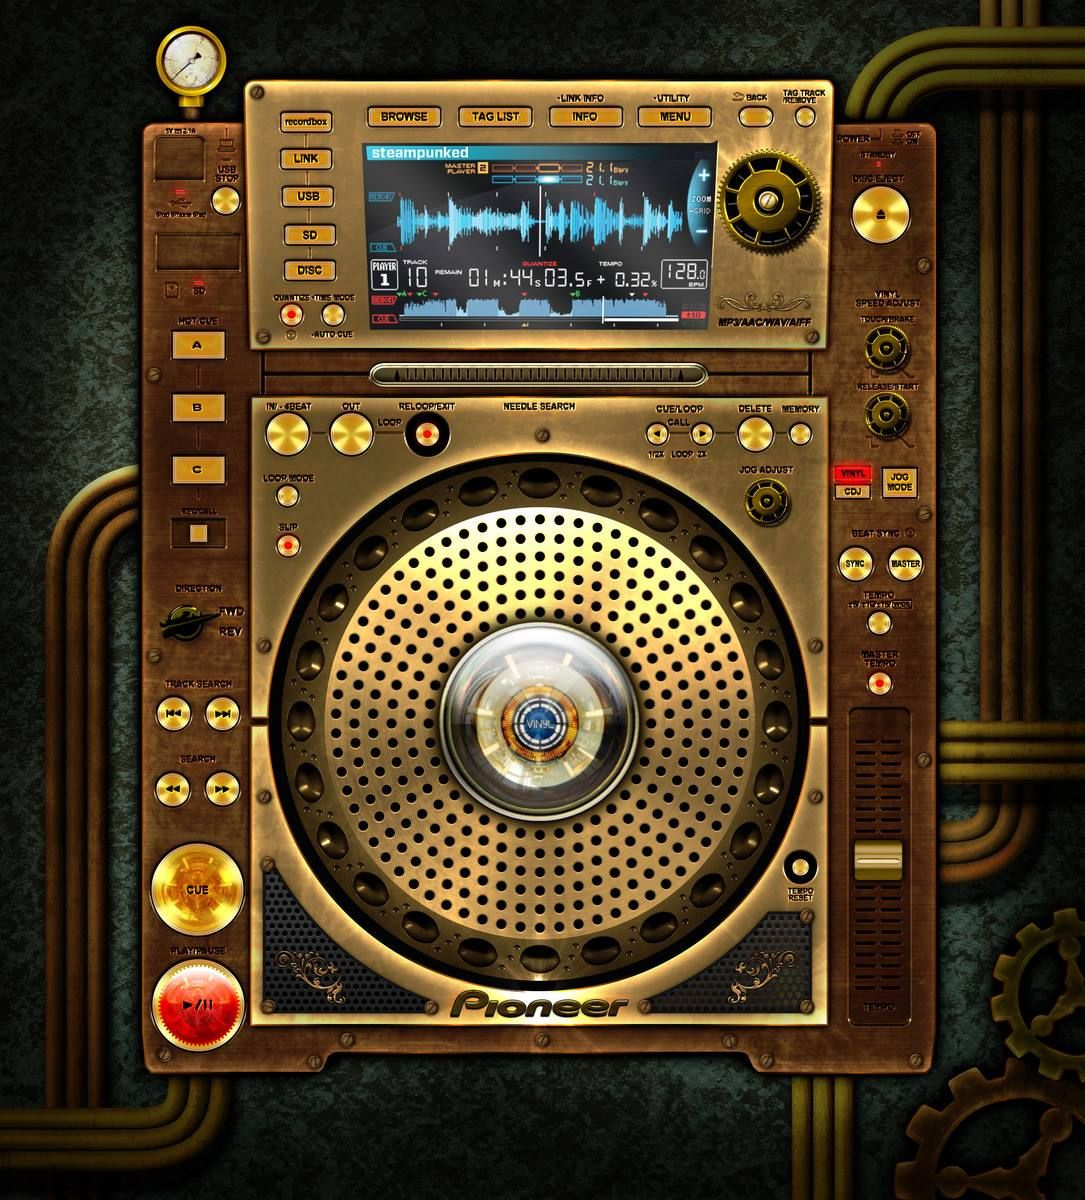 pin pioneer cdj 2000 - photo #4